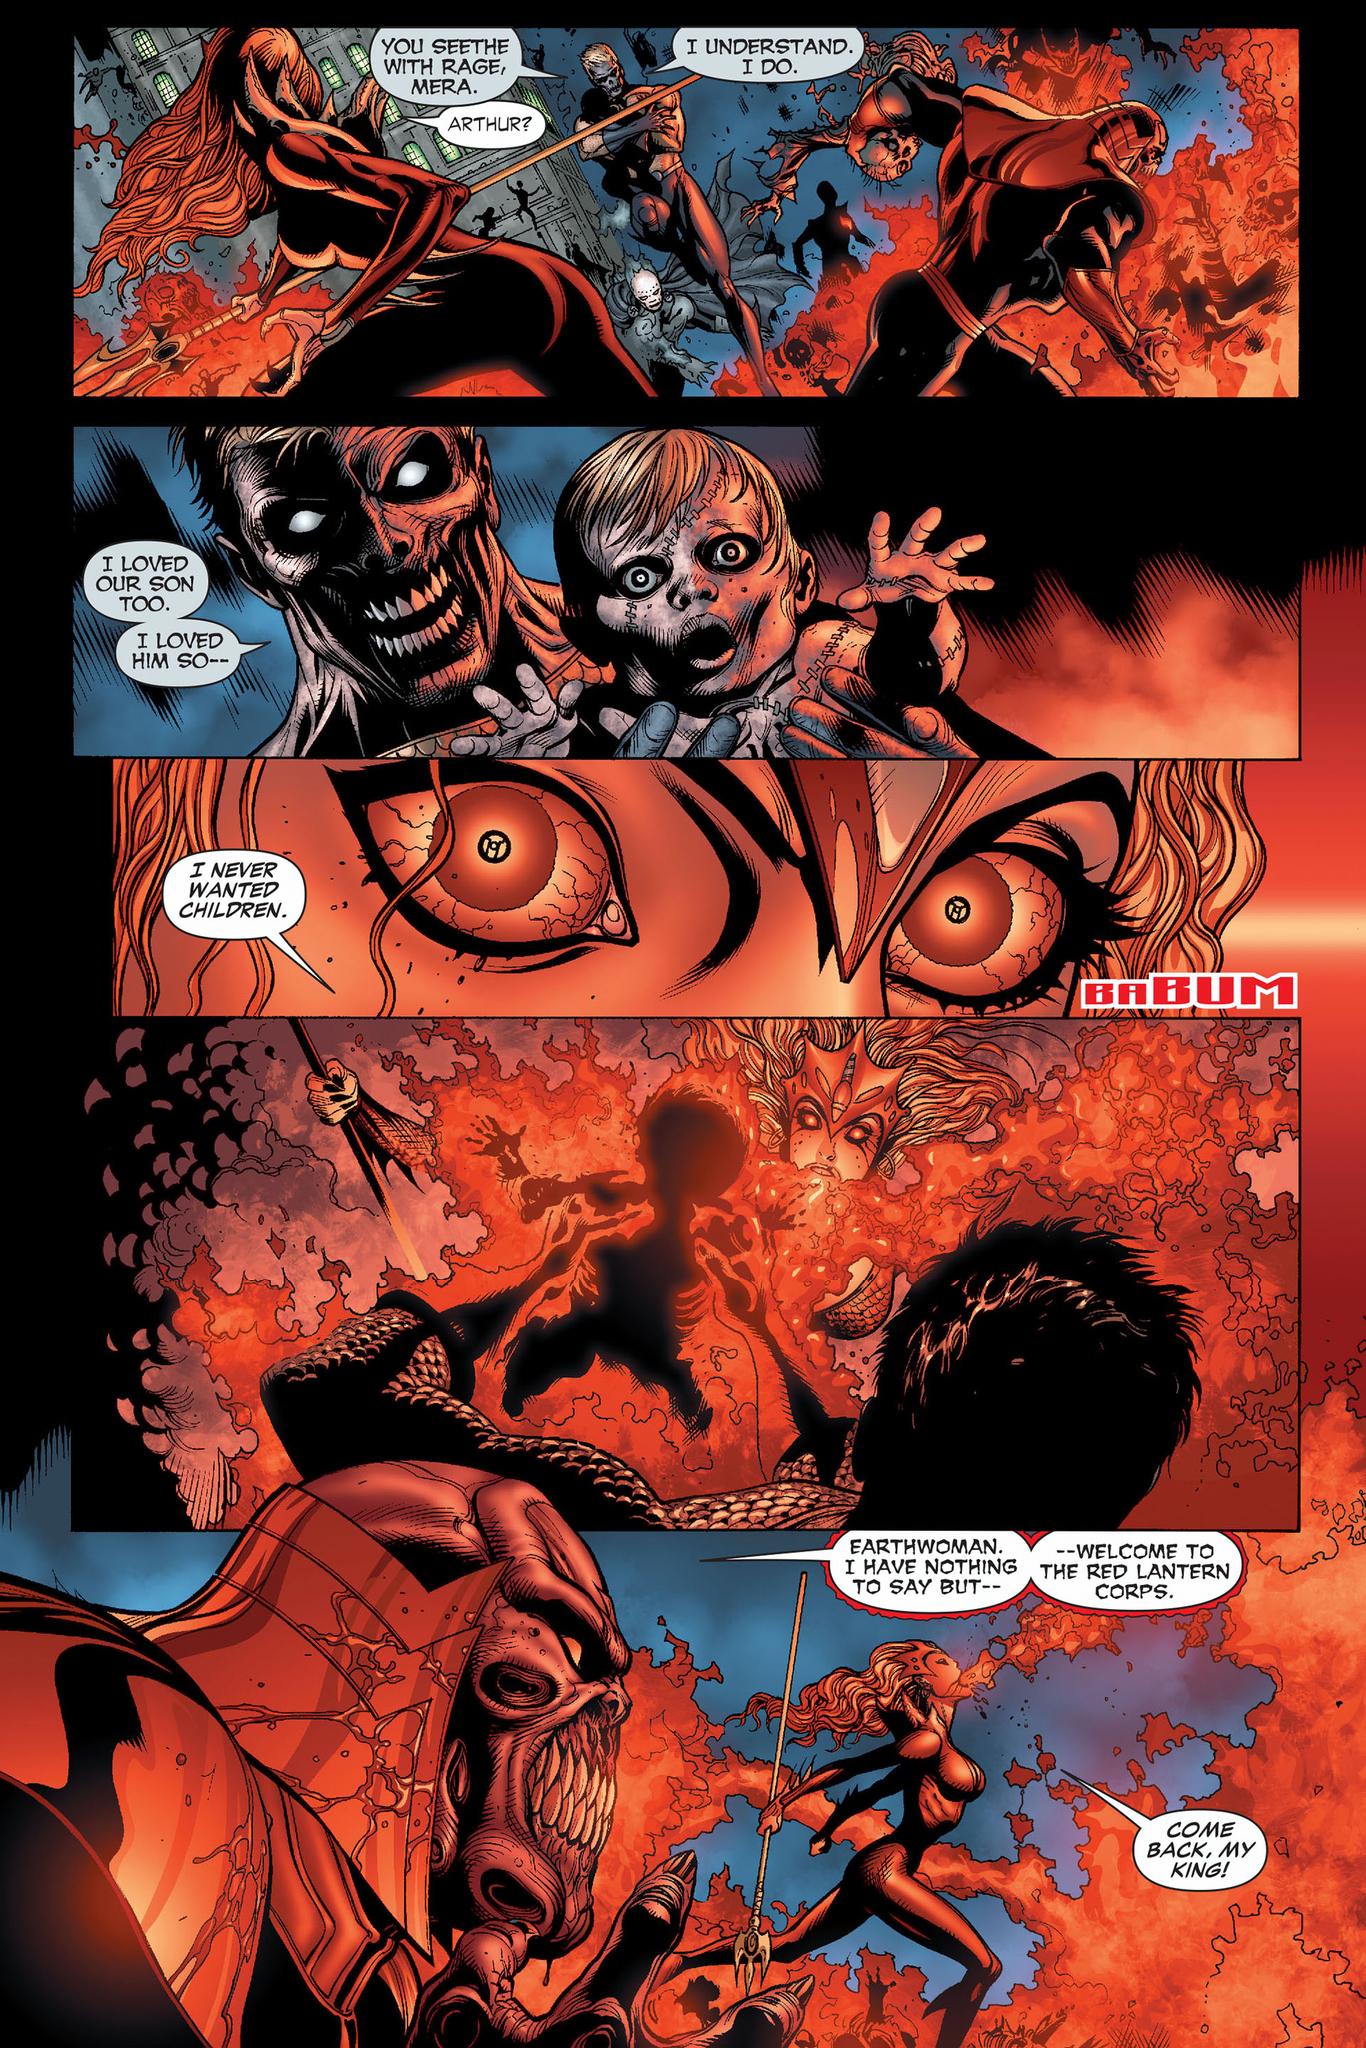 Red Lantern Mera VS Black Lantern Aquaman Comicnewbies